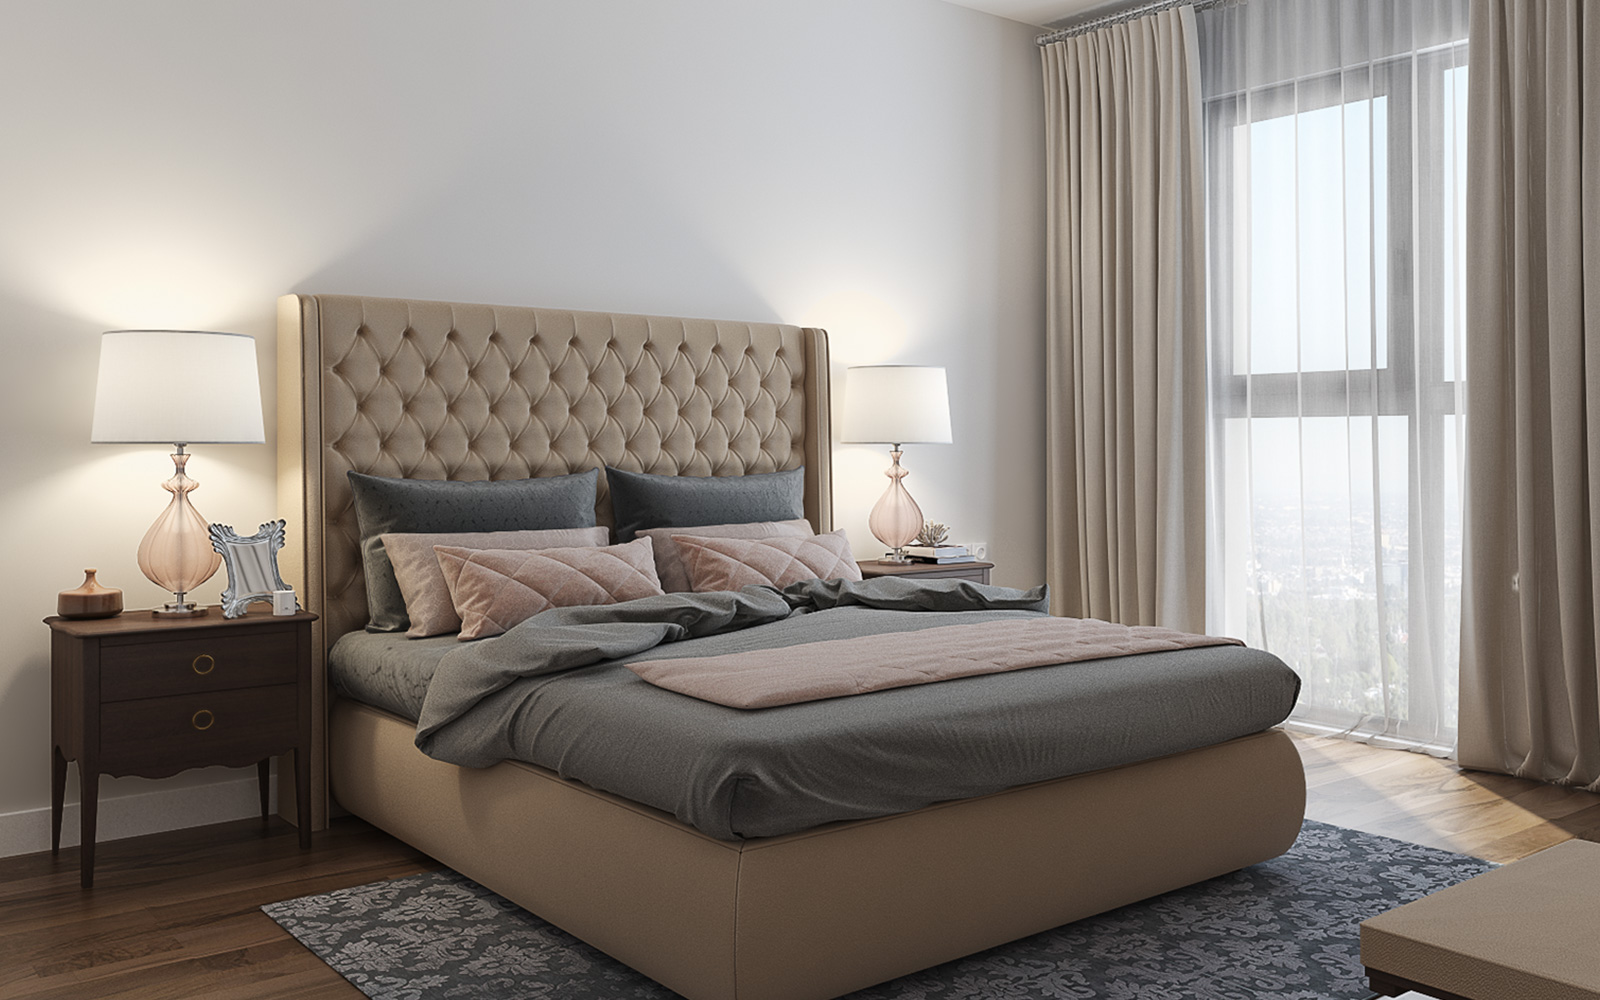 Vogue Design - Istanbul Gayrettepe Flat5